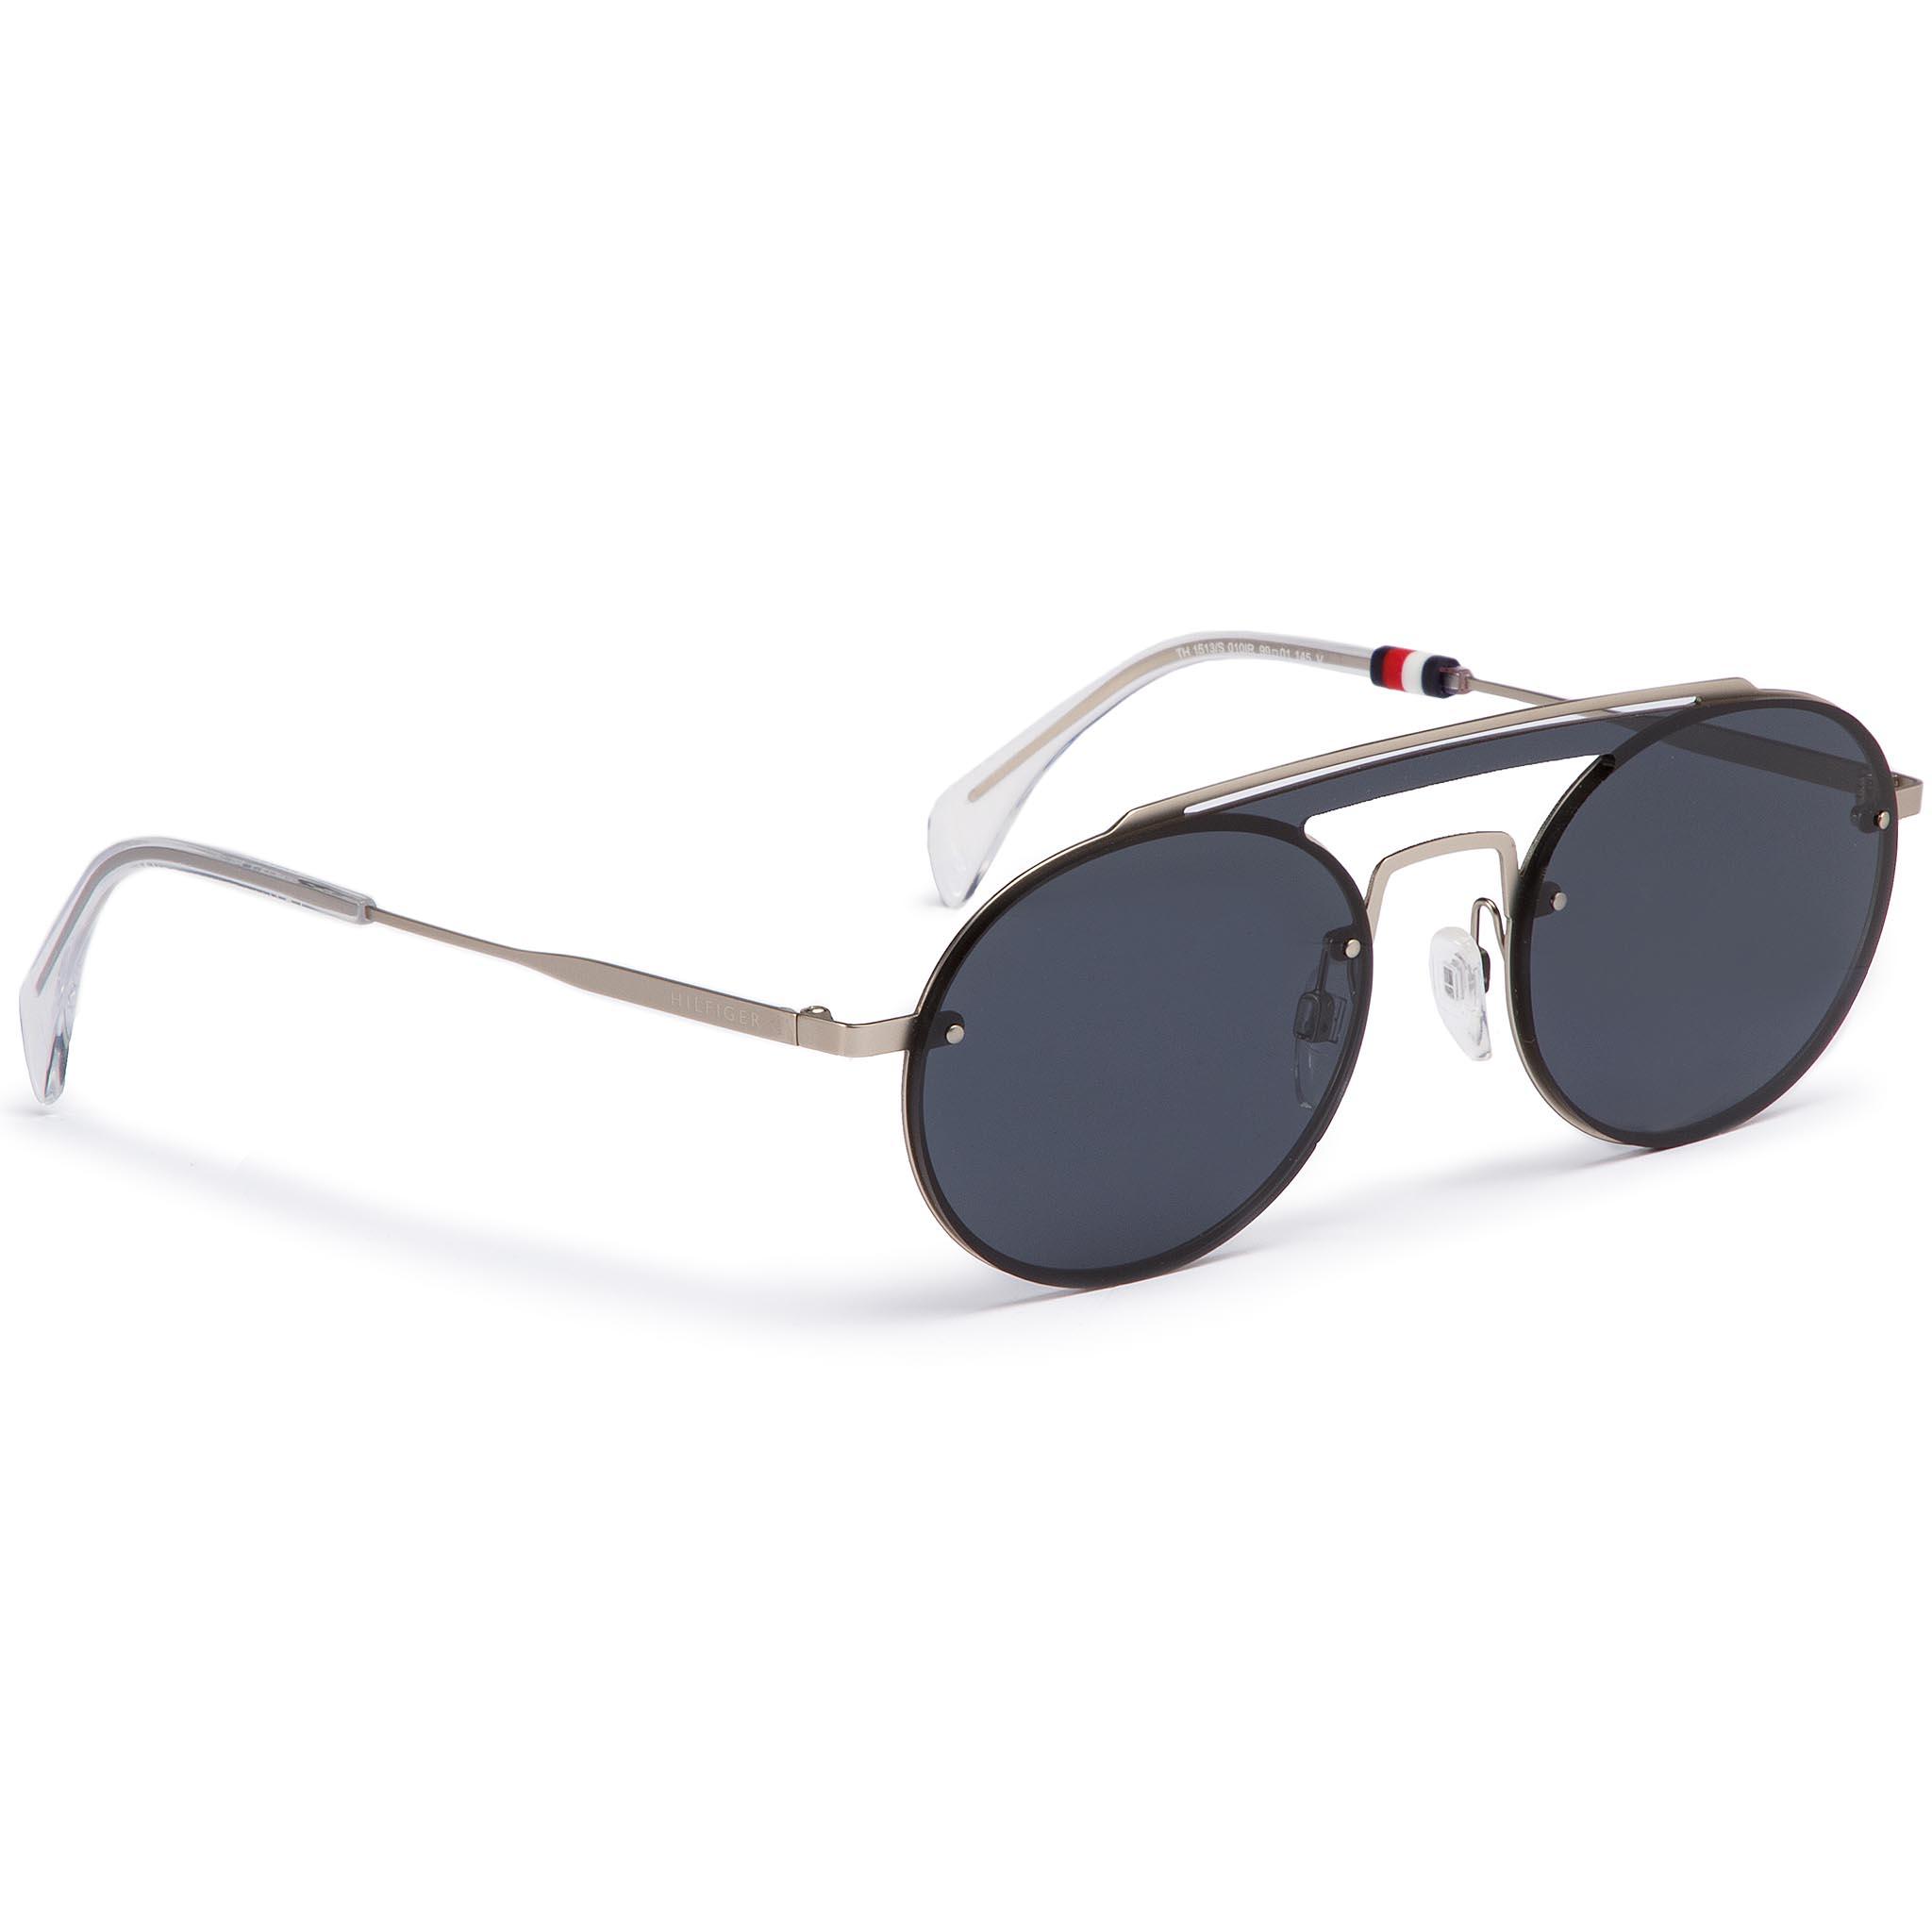 Slnečné okuliare TOMMY HILFIGER - 1513 S Palladium 010 - Glami.sk 72708621084